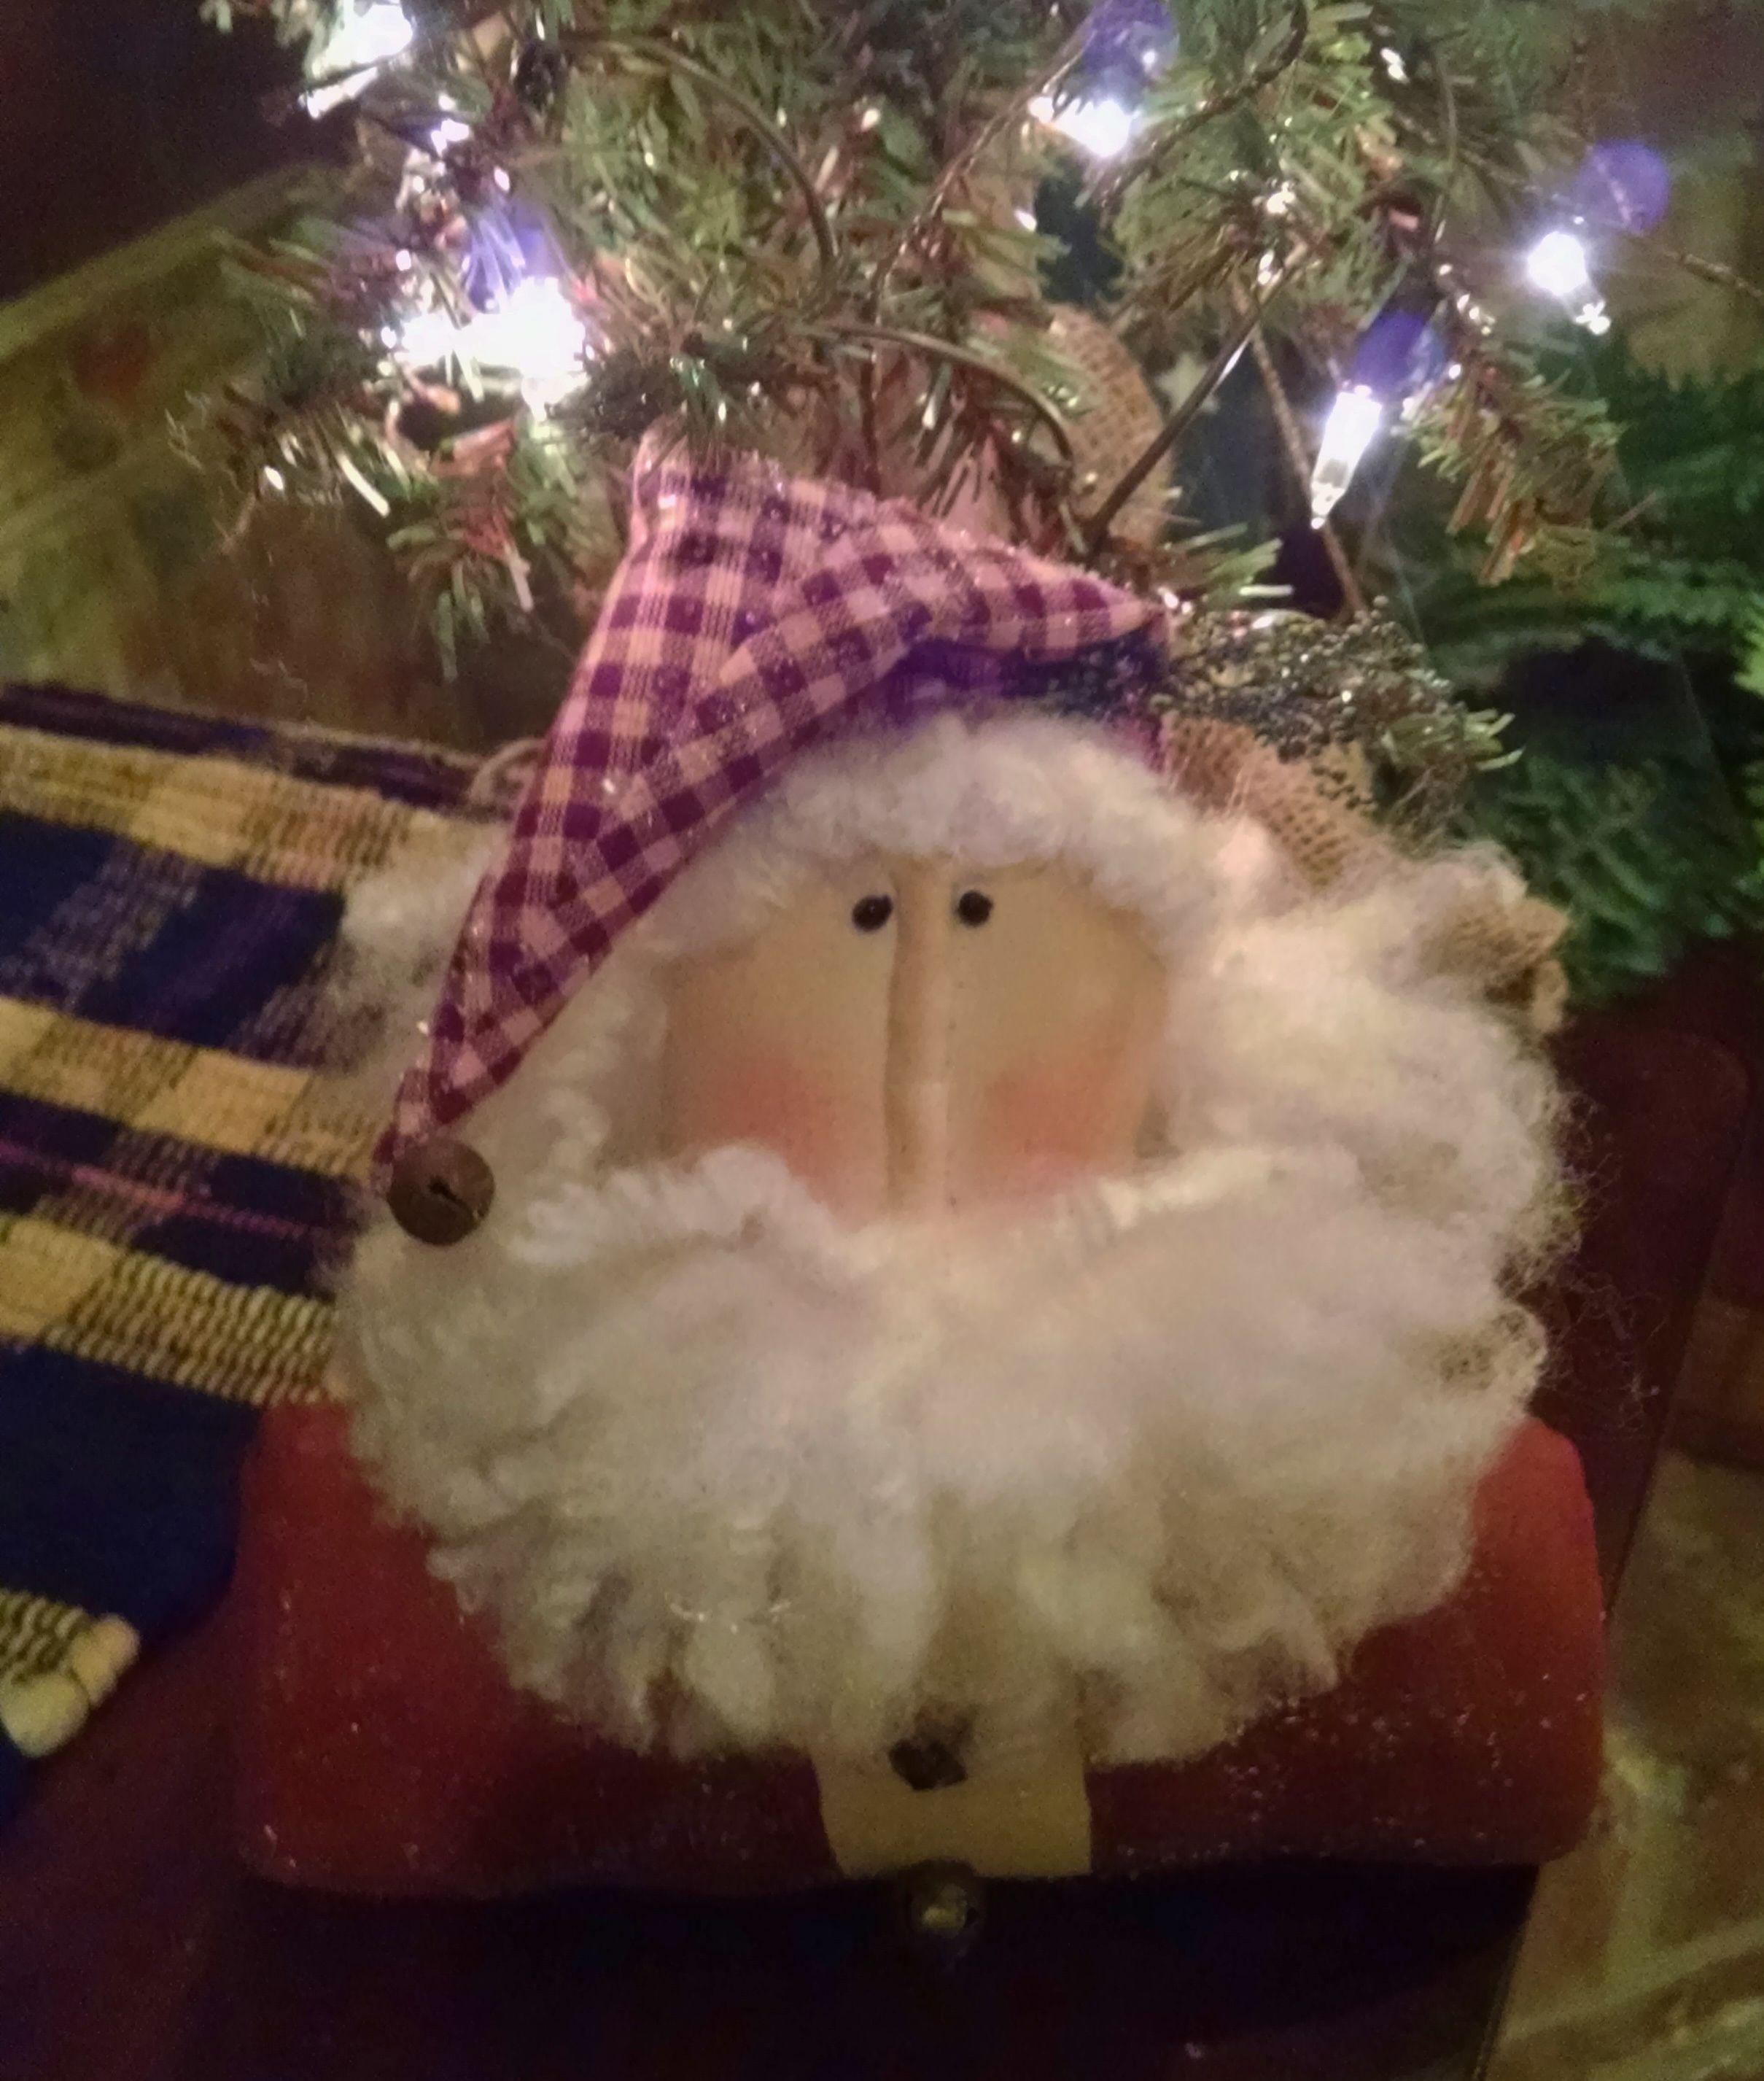 https://www.etsy.com/listing/251404219/primitive-handmade-santa-shelf-sitter?ref=listing-shop-header-1